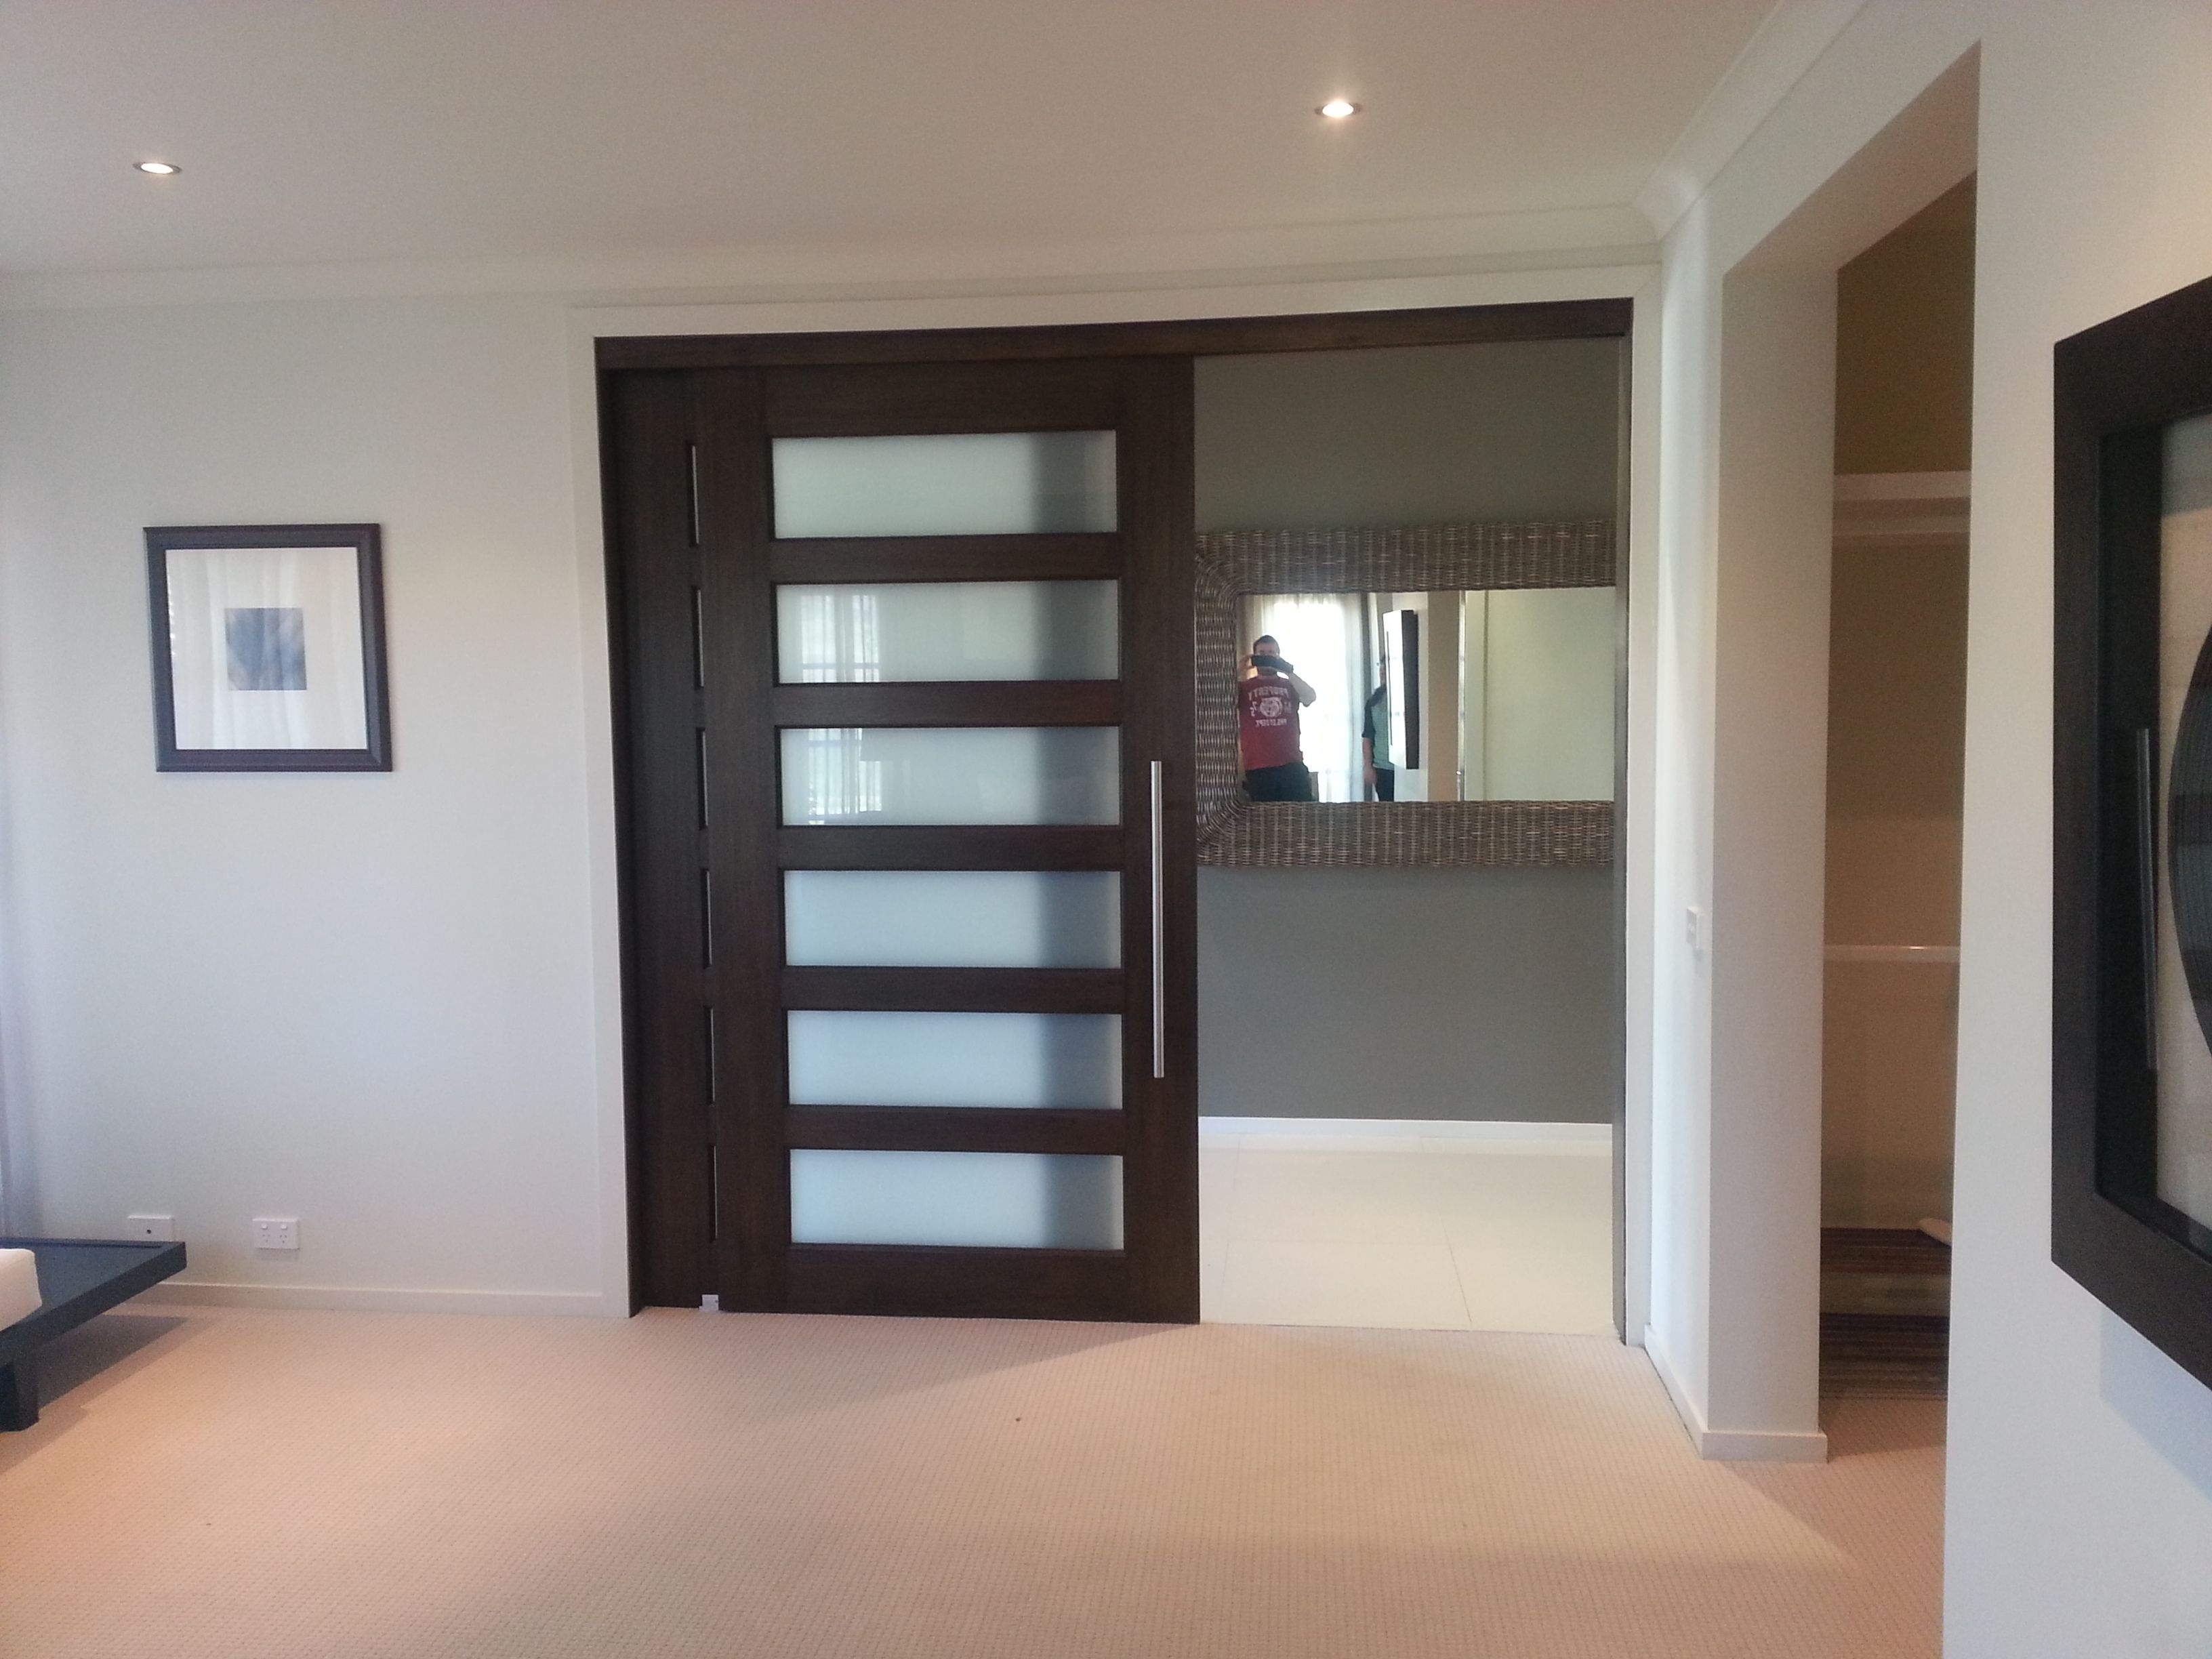 Interior Sliding Door With Opaque Glass Panels From Further Away Sliding Door Bookcase Sliding Glass Door Sliding Doors Interior